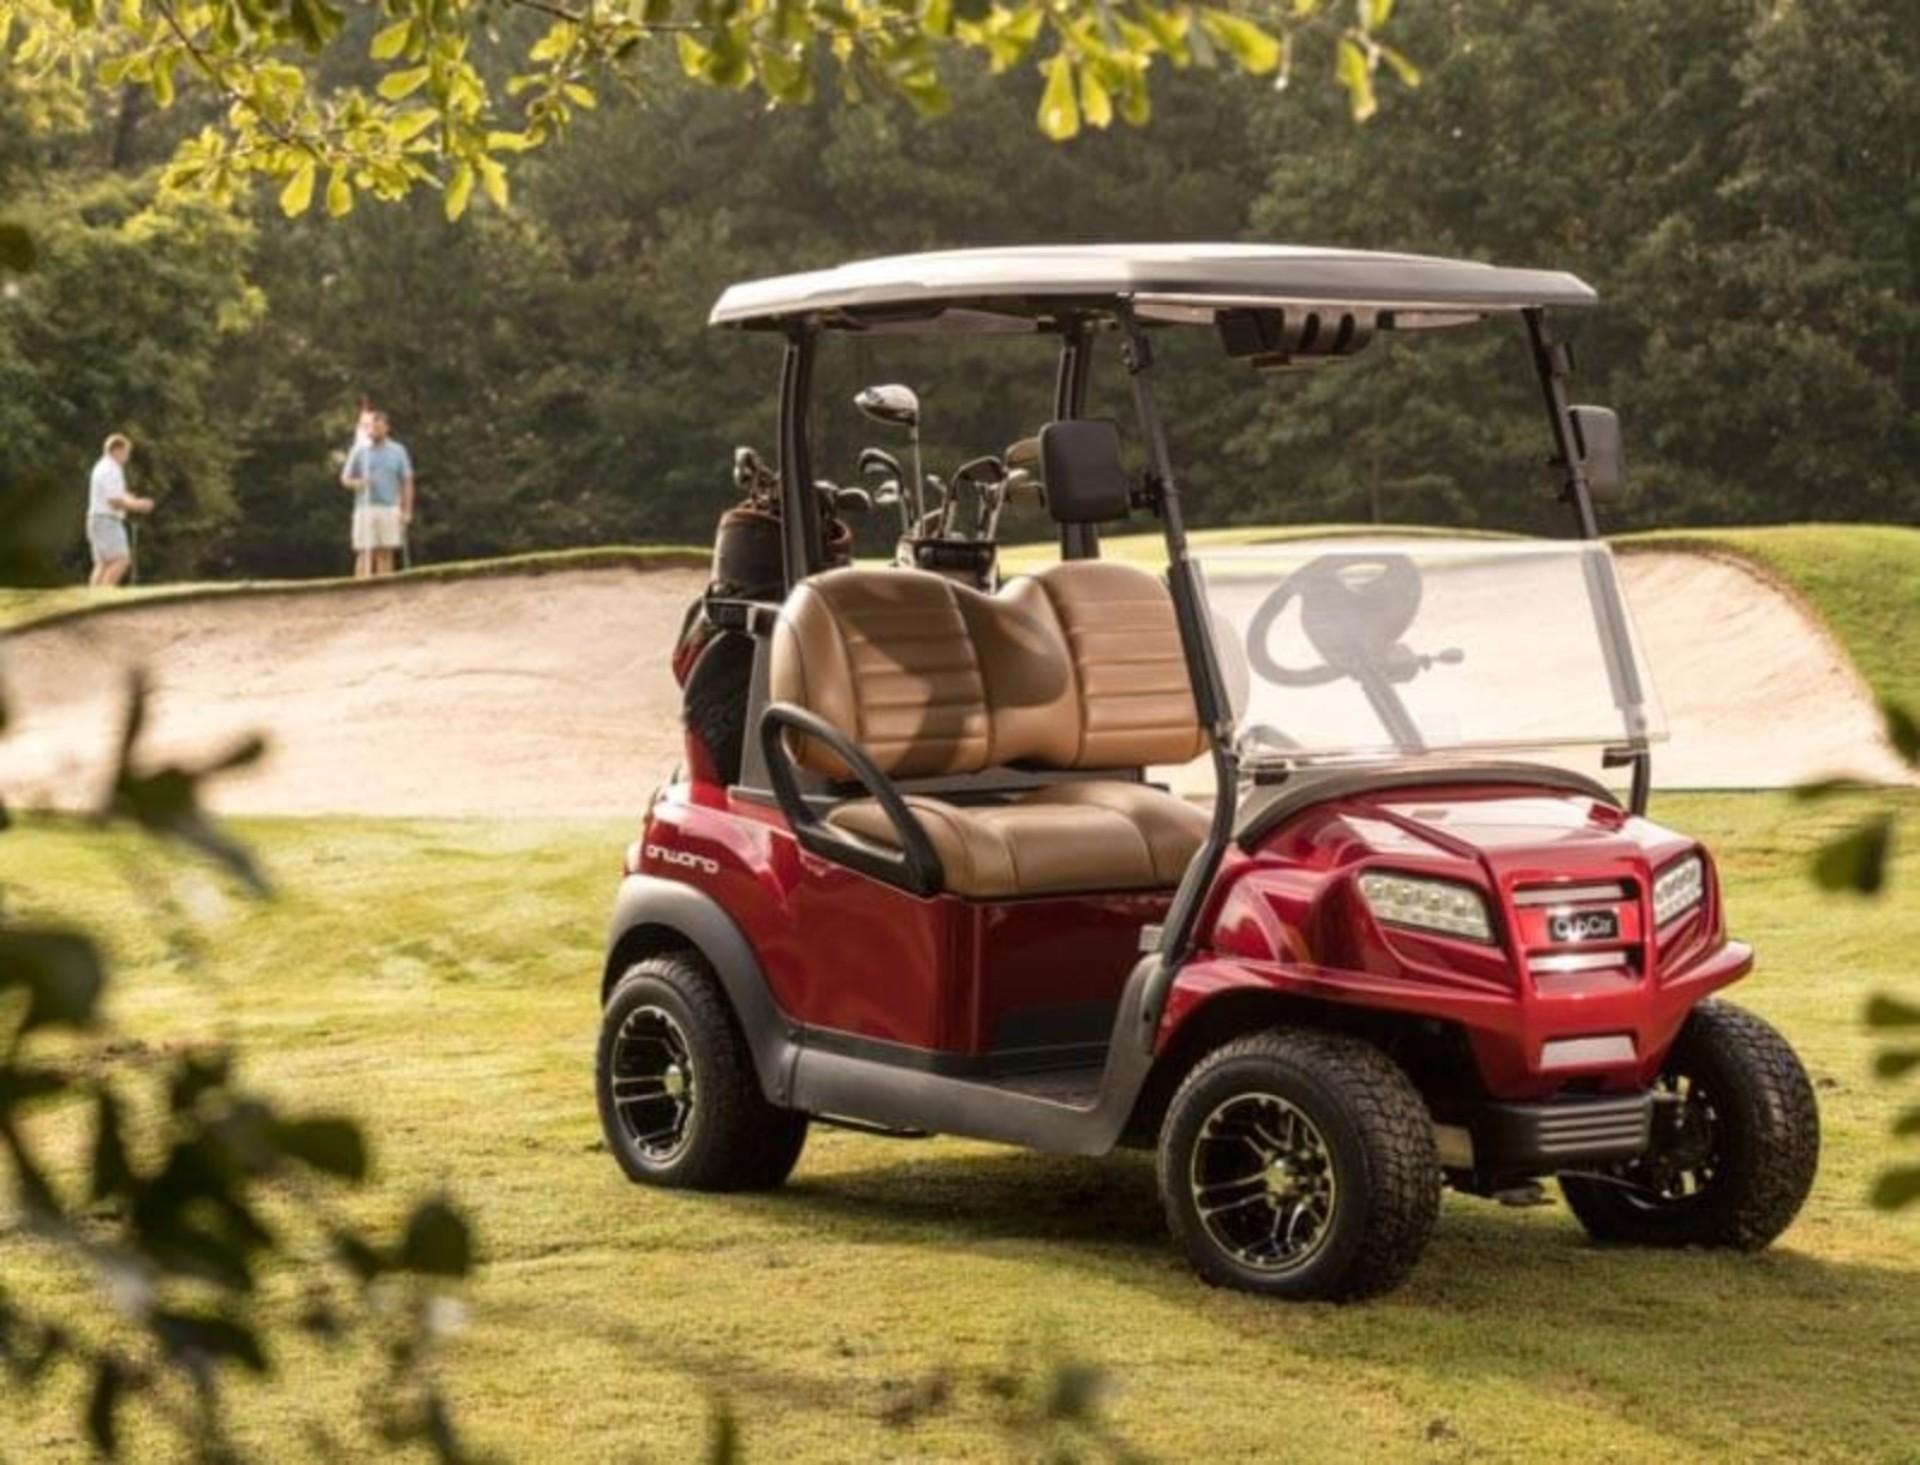 american pride golf cart wiring diagram wiring diagramgulf coast golf cartsamerican pride golf cart wiring diagram 8